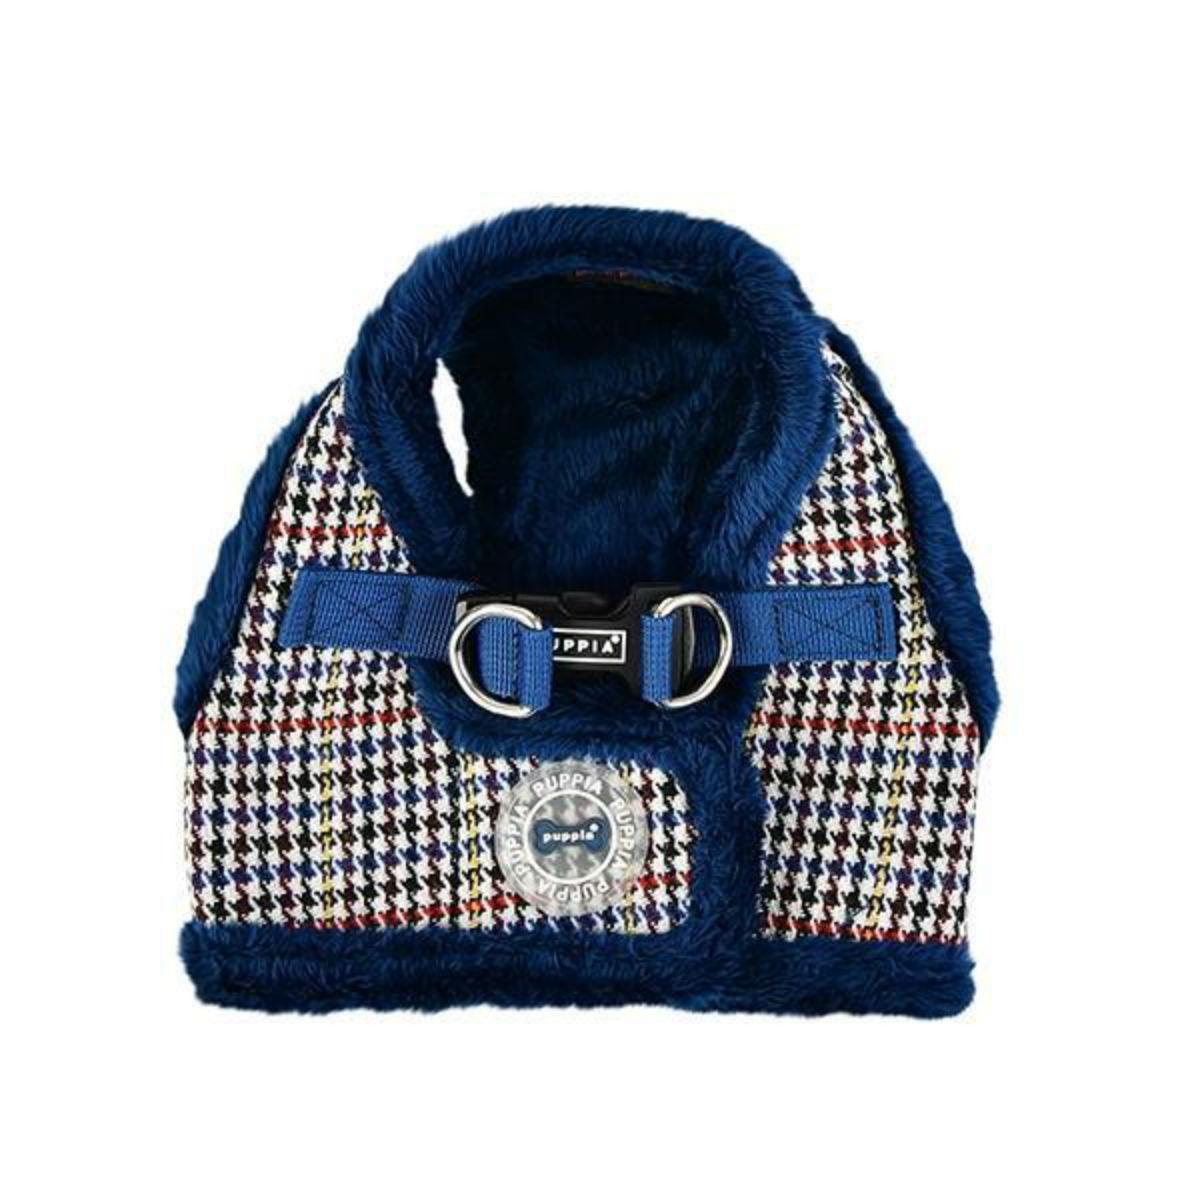 Auden Vest Style Dog Harness by Puppia - Blue